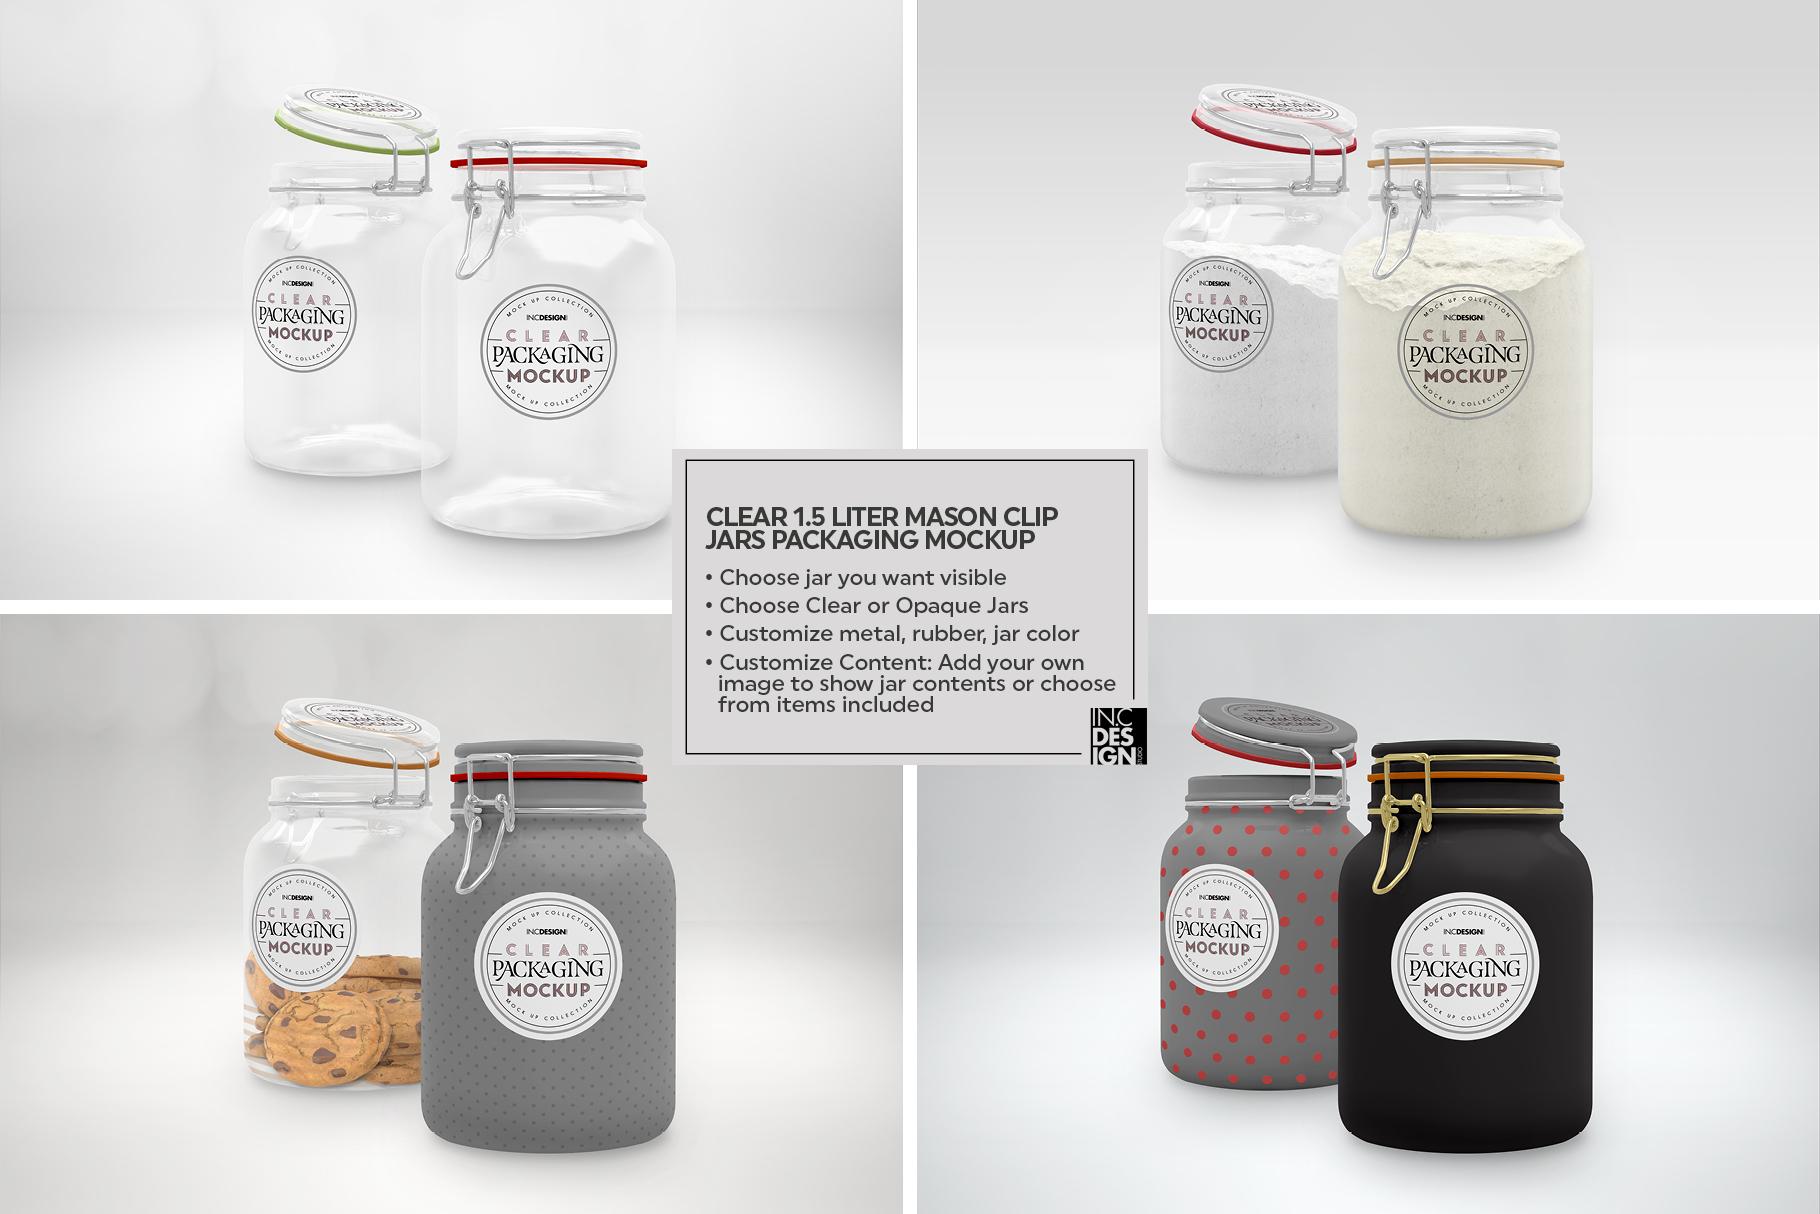 Clear 1.5 Liter Mason Clip Jar Packaging Mockup example image 2